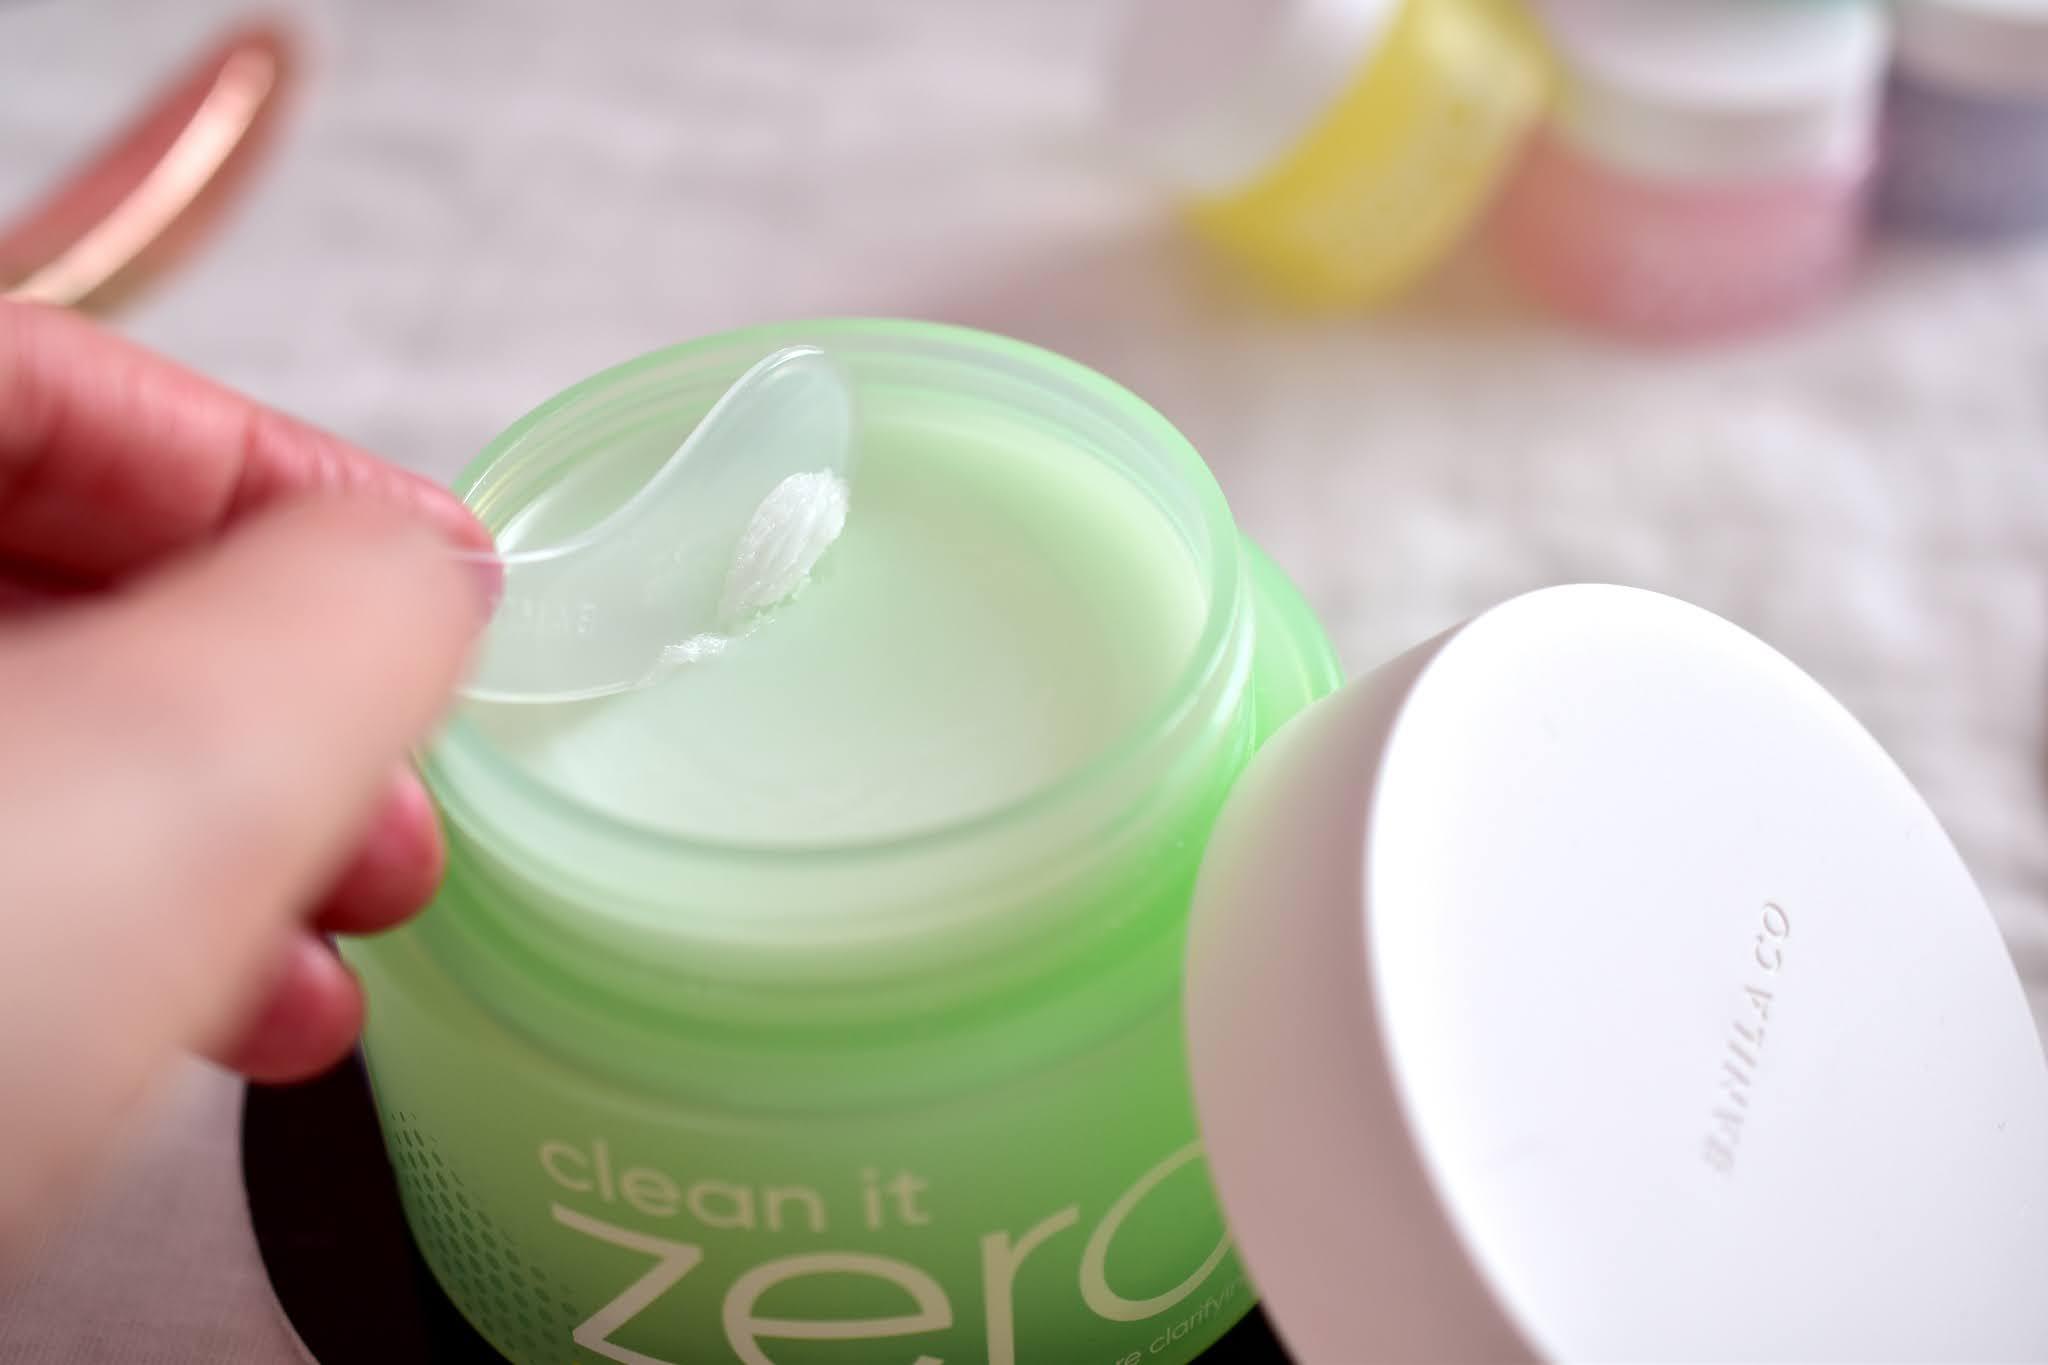 Banila Co Clean It Zero Clarifying